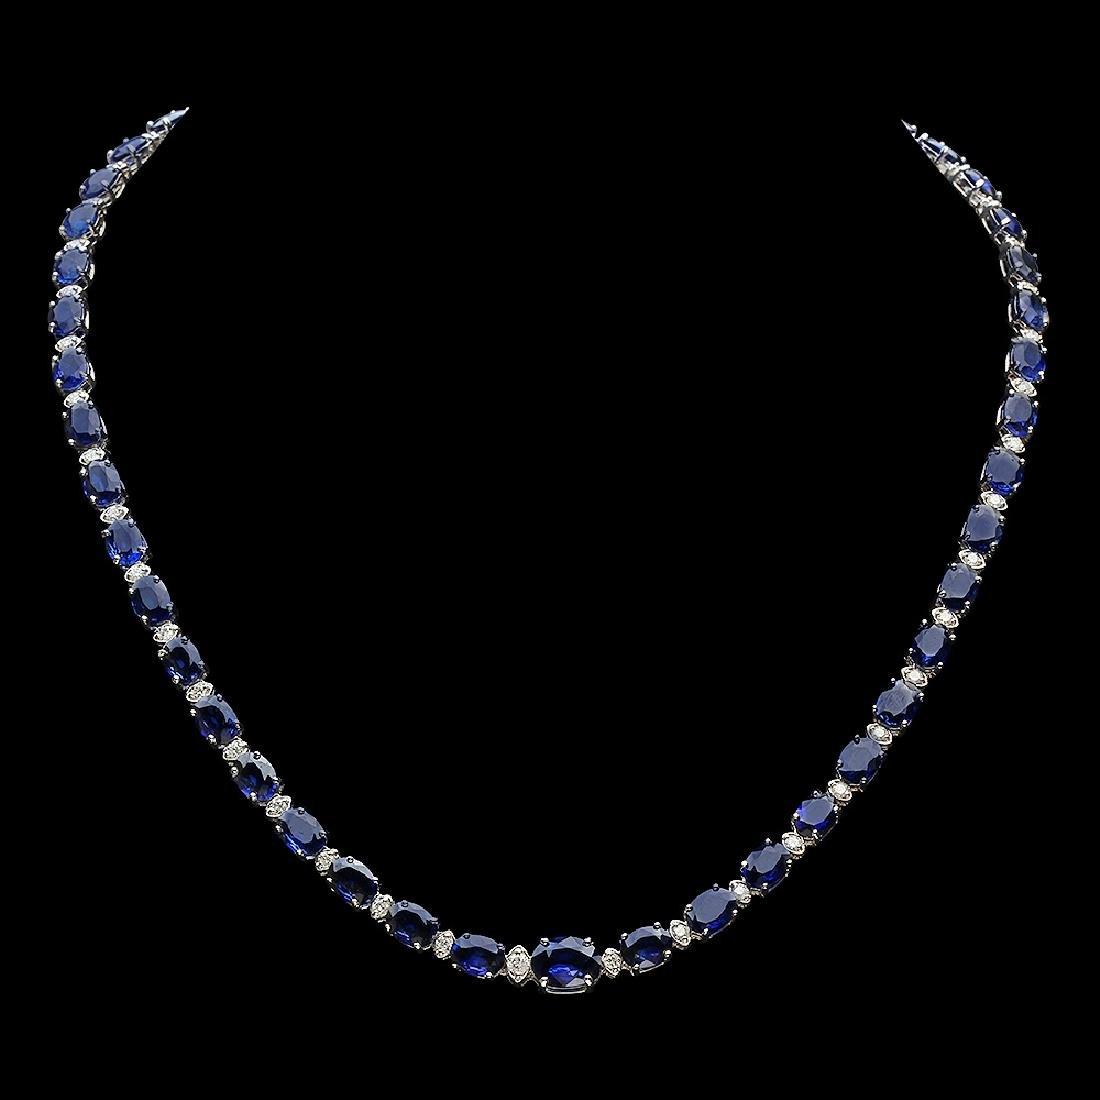 14K Gold 38.53ct Sapphire 1.70ct Diamond Necklace